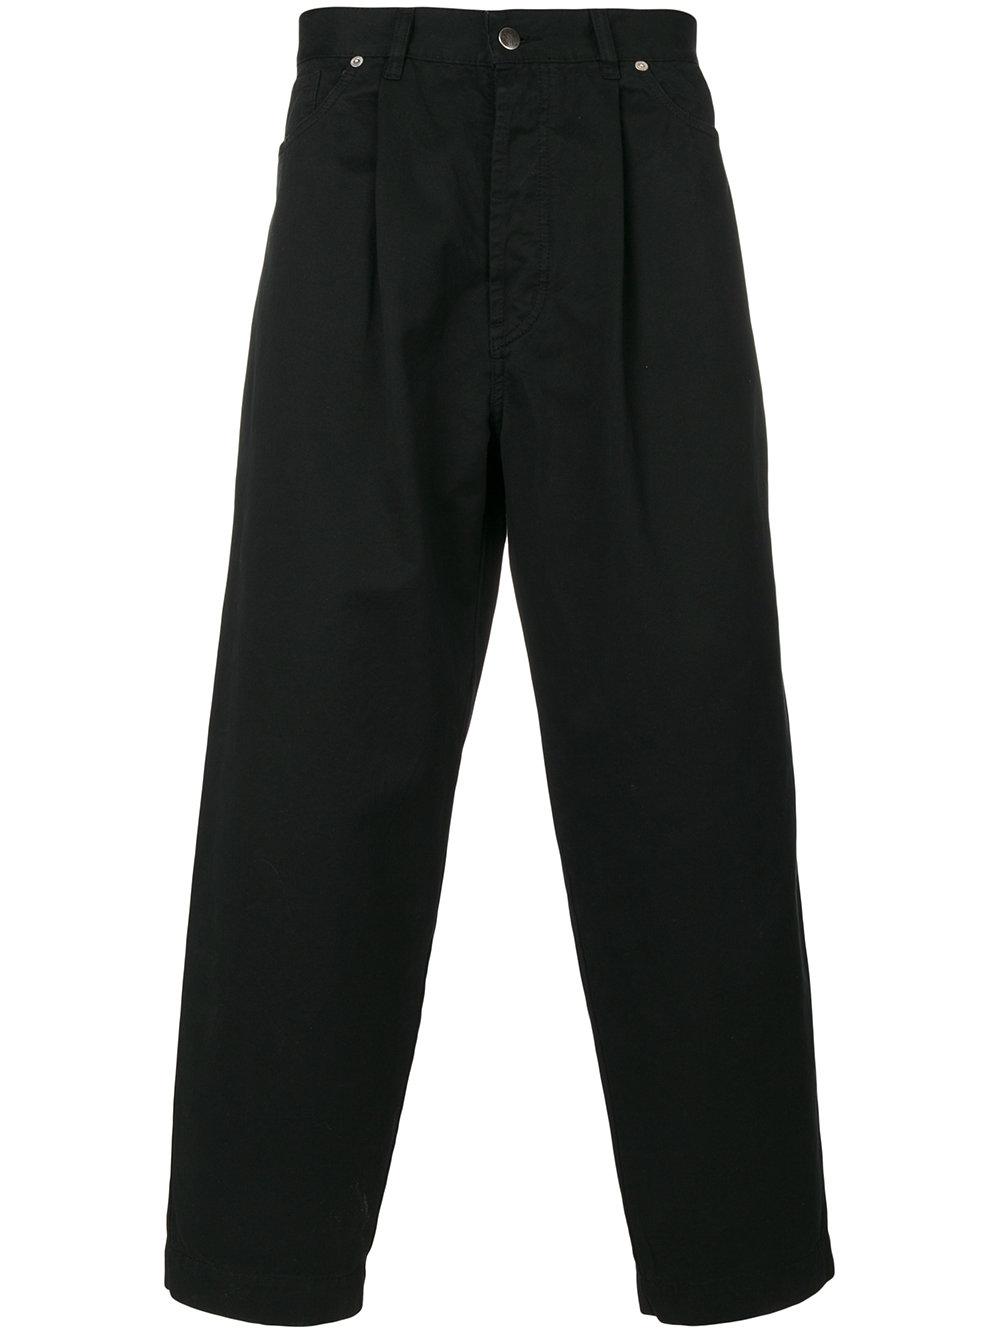 SOCIÉTÉ-ANONYME-Japboy-trousers.jpg